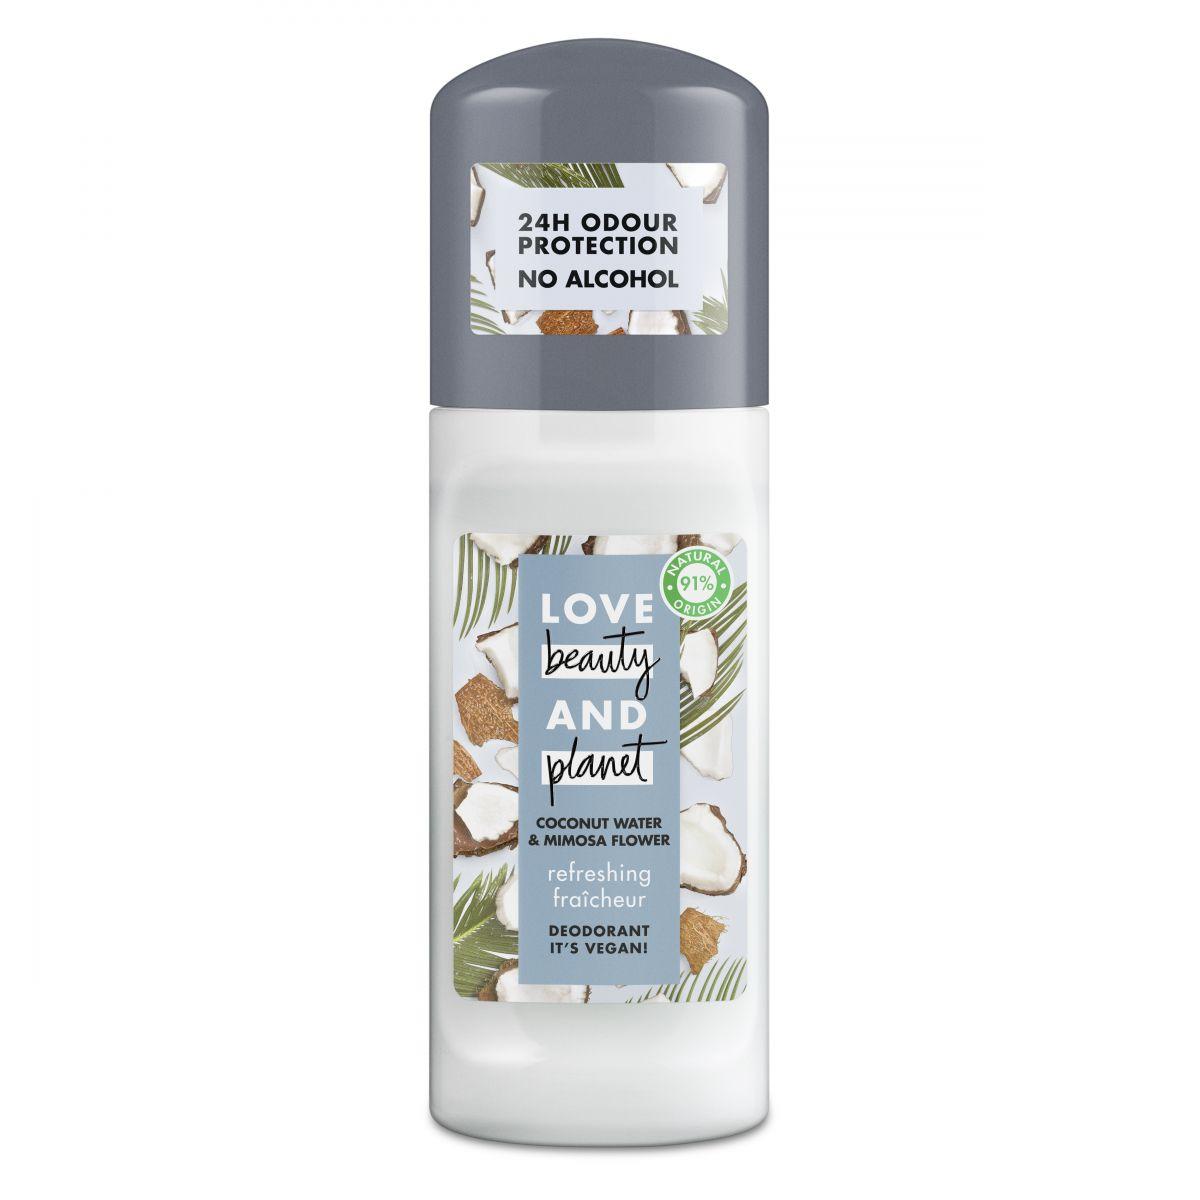 LBP_PackImage_FOP_CoconutWater_Deodorant_Rollon_EU